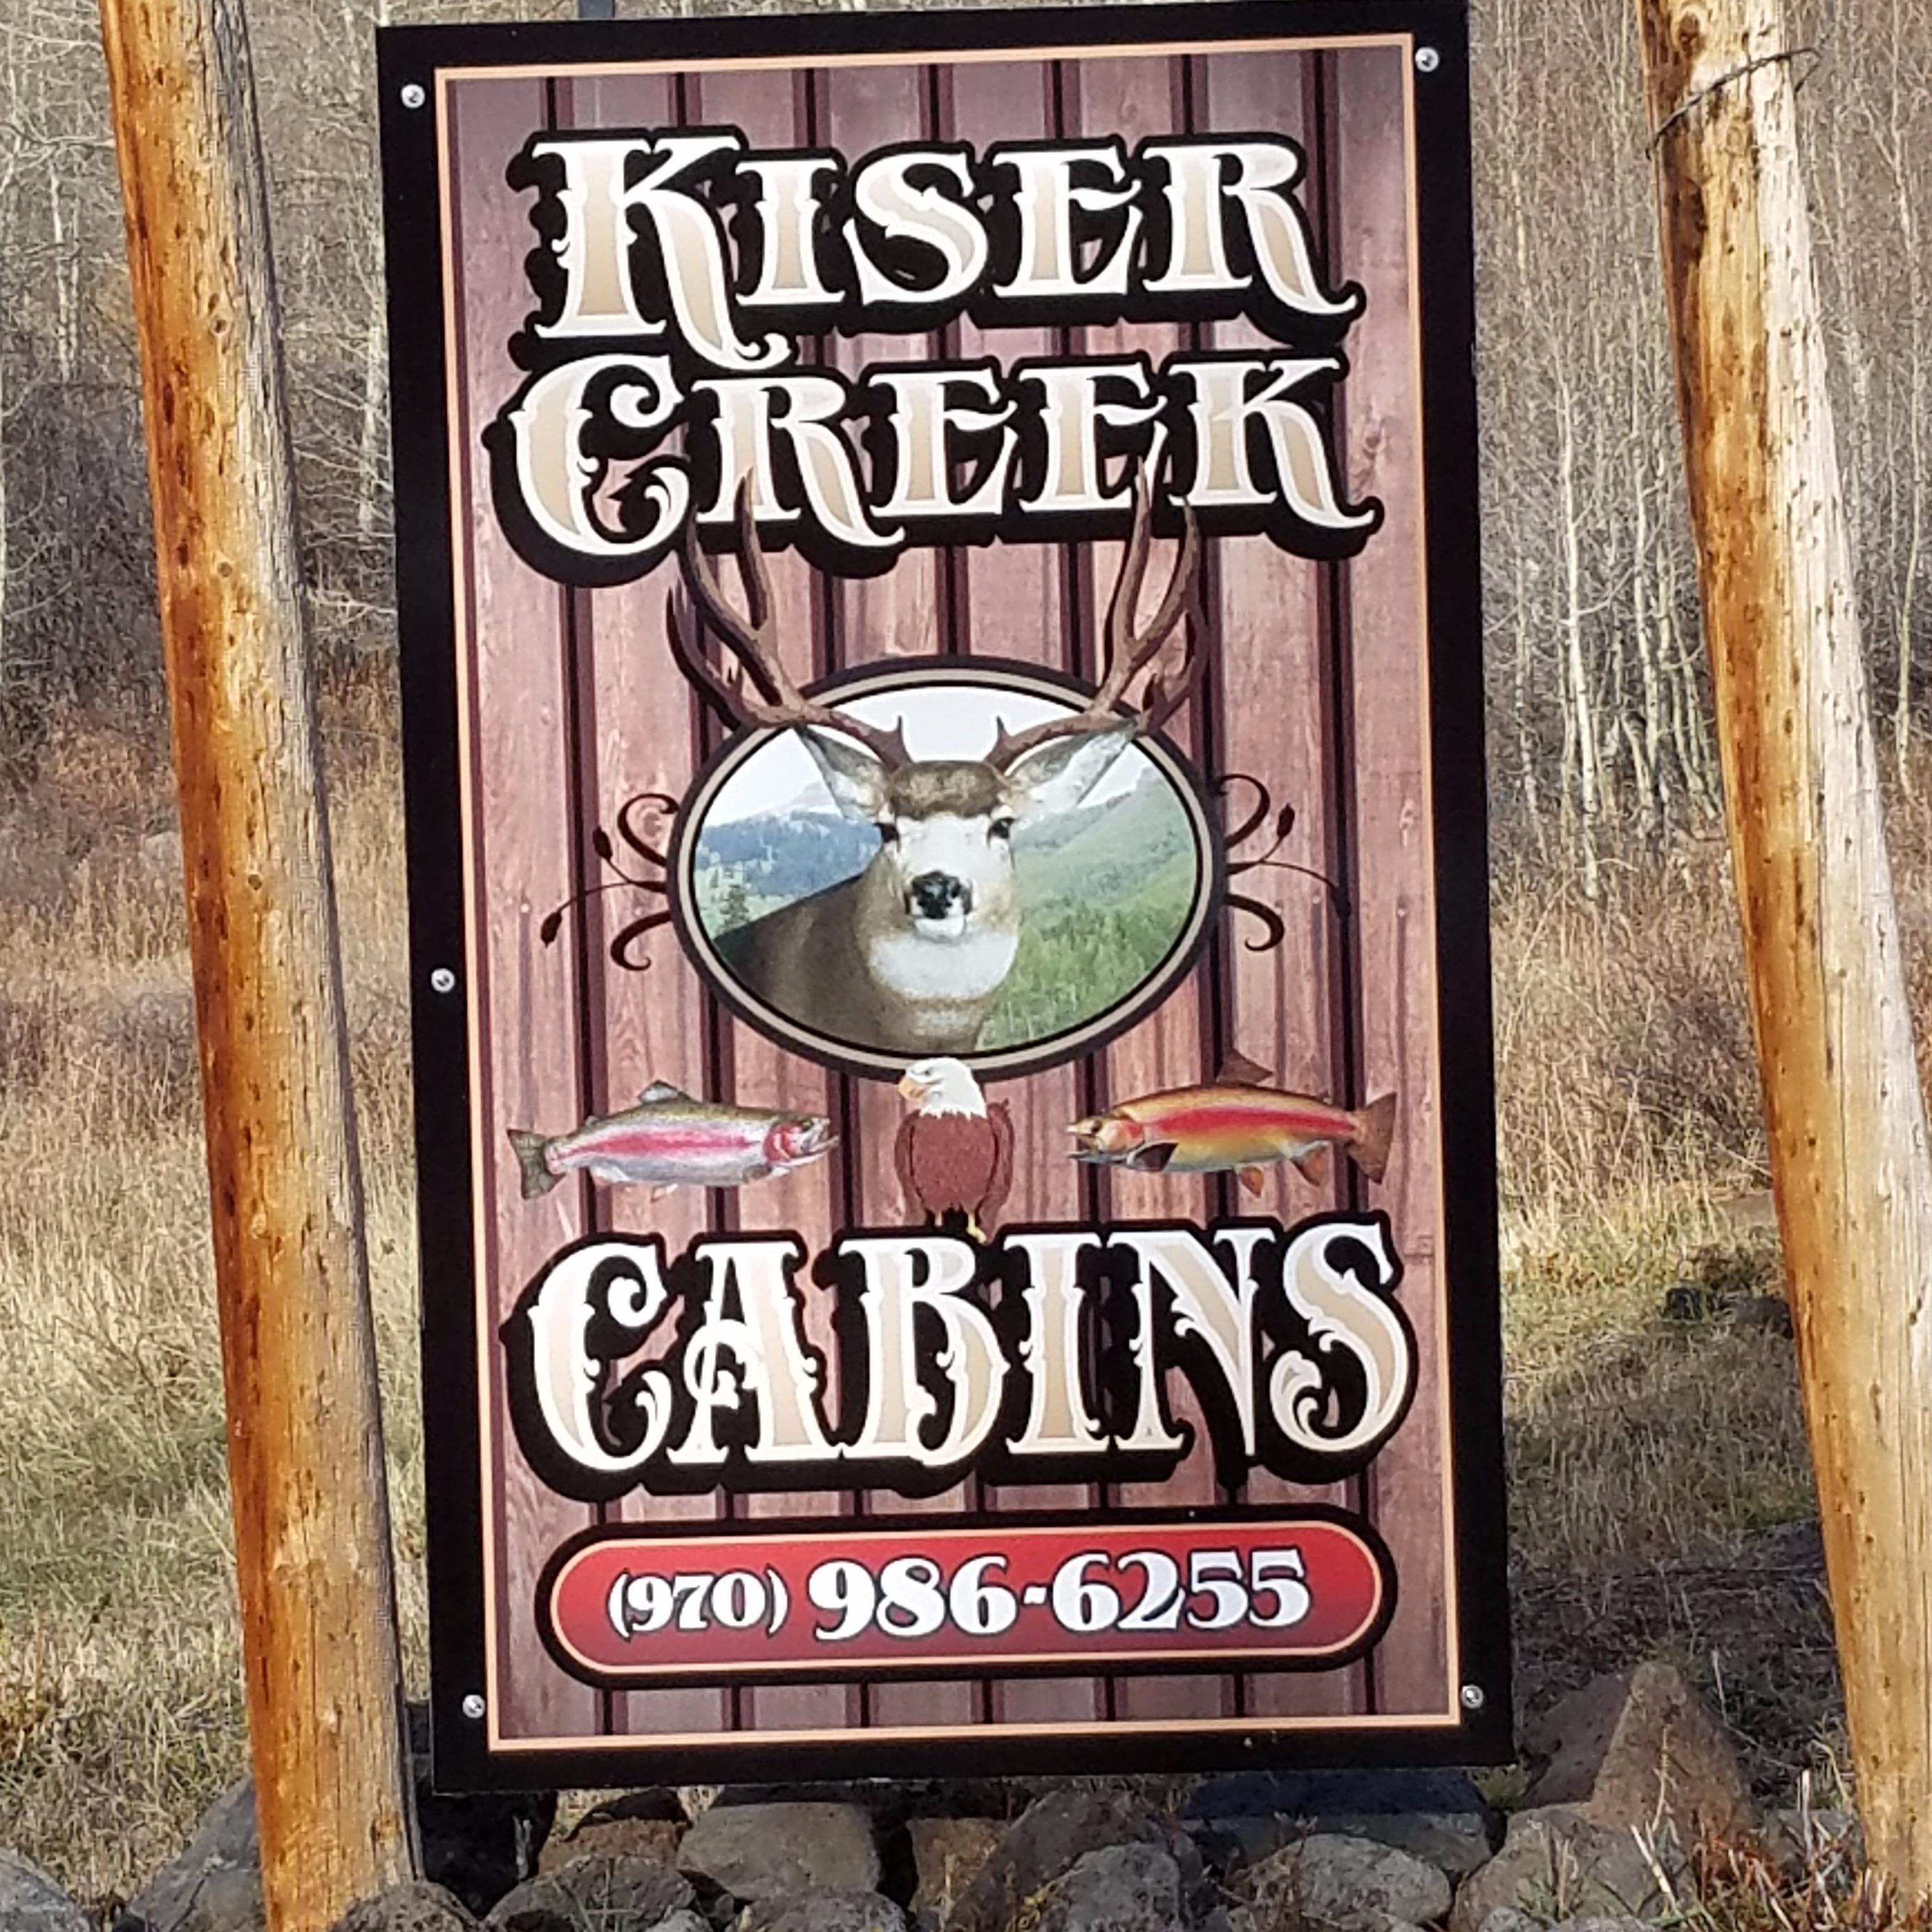 Kiser Creek Cabins Llc